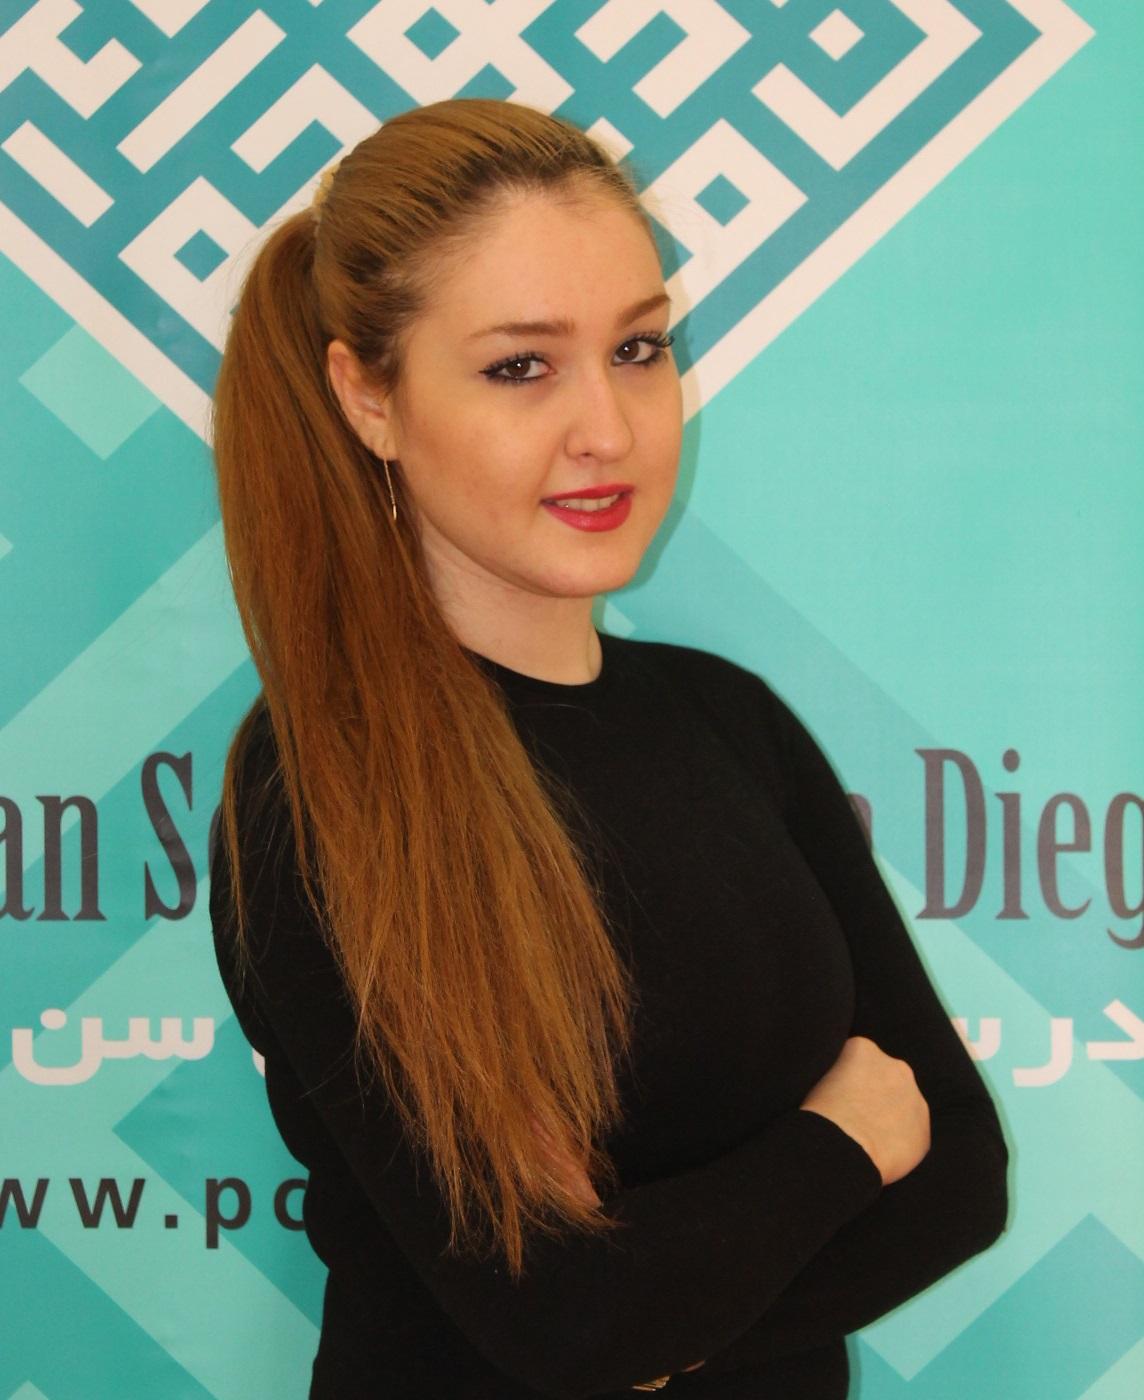 Ayla Derafshandar